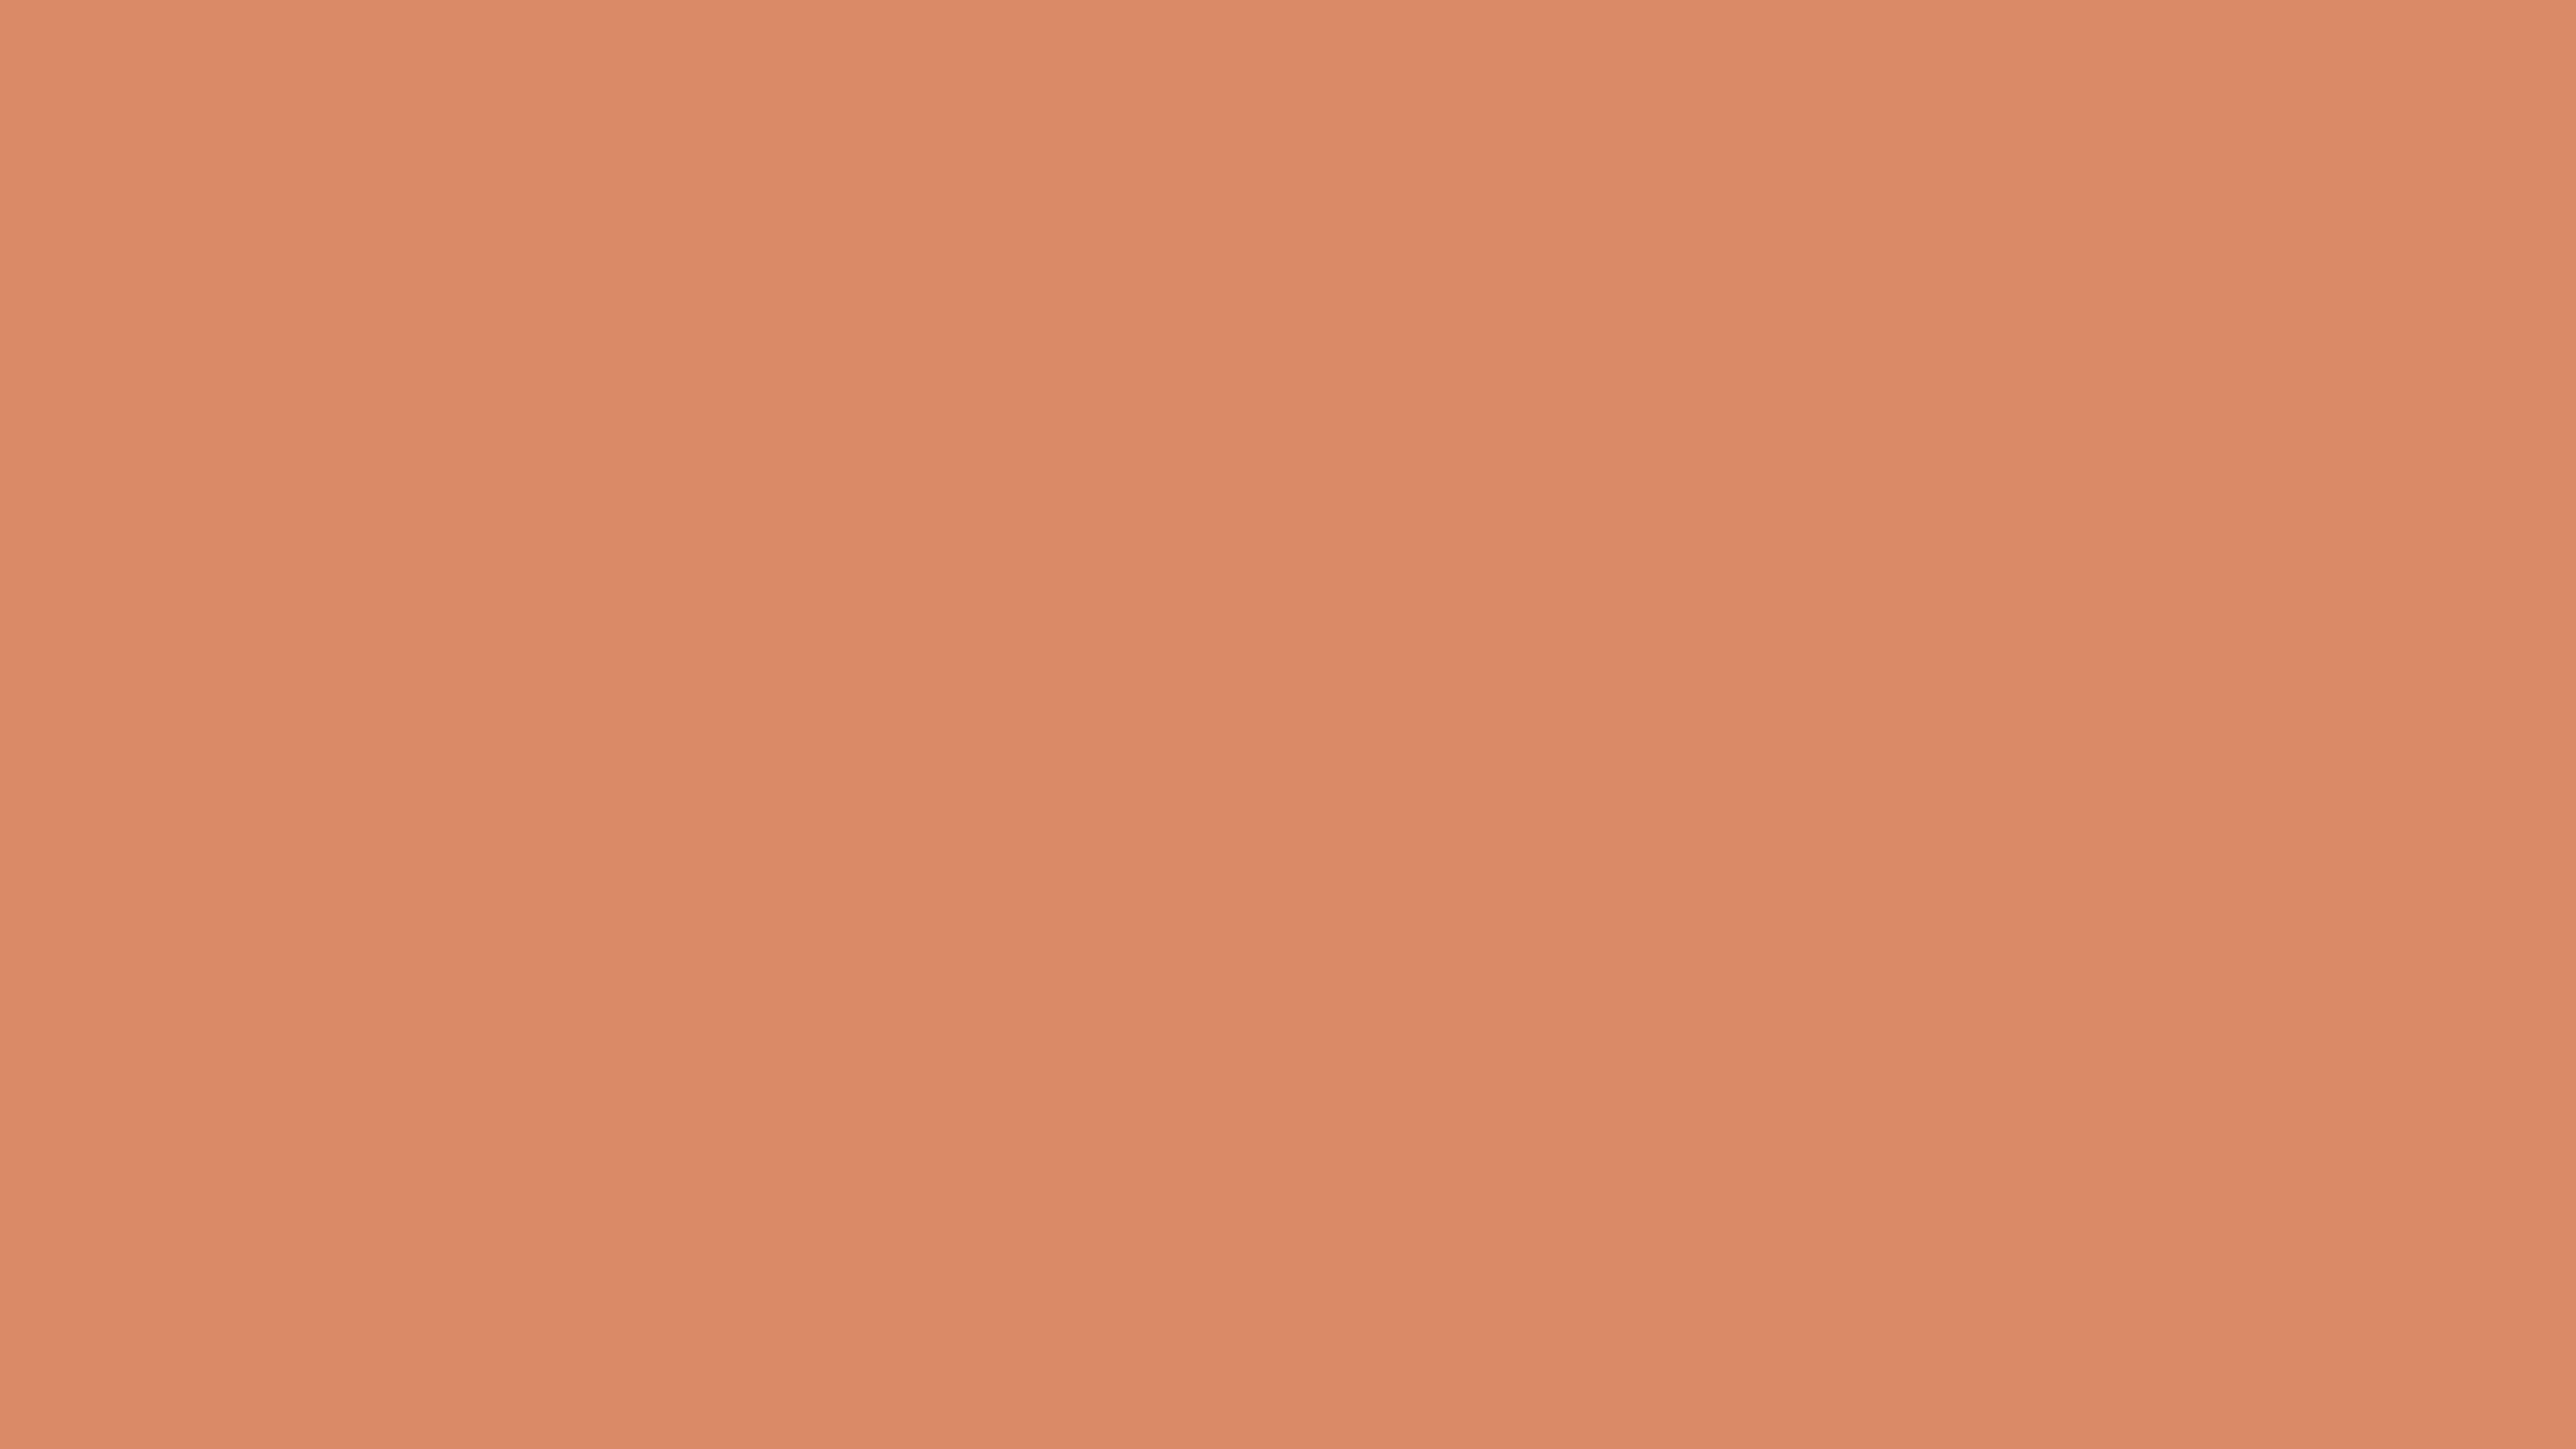 Pale Copper Solid Color Background Wallpaper [5120x2880]